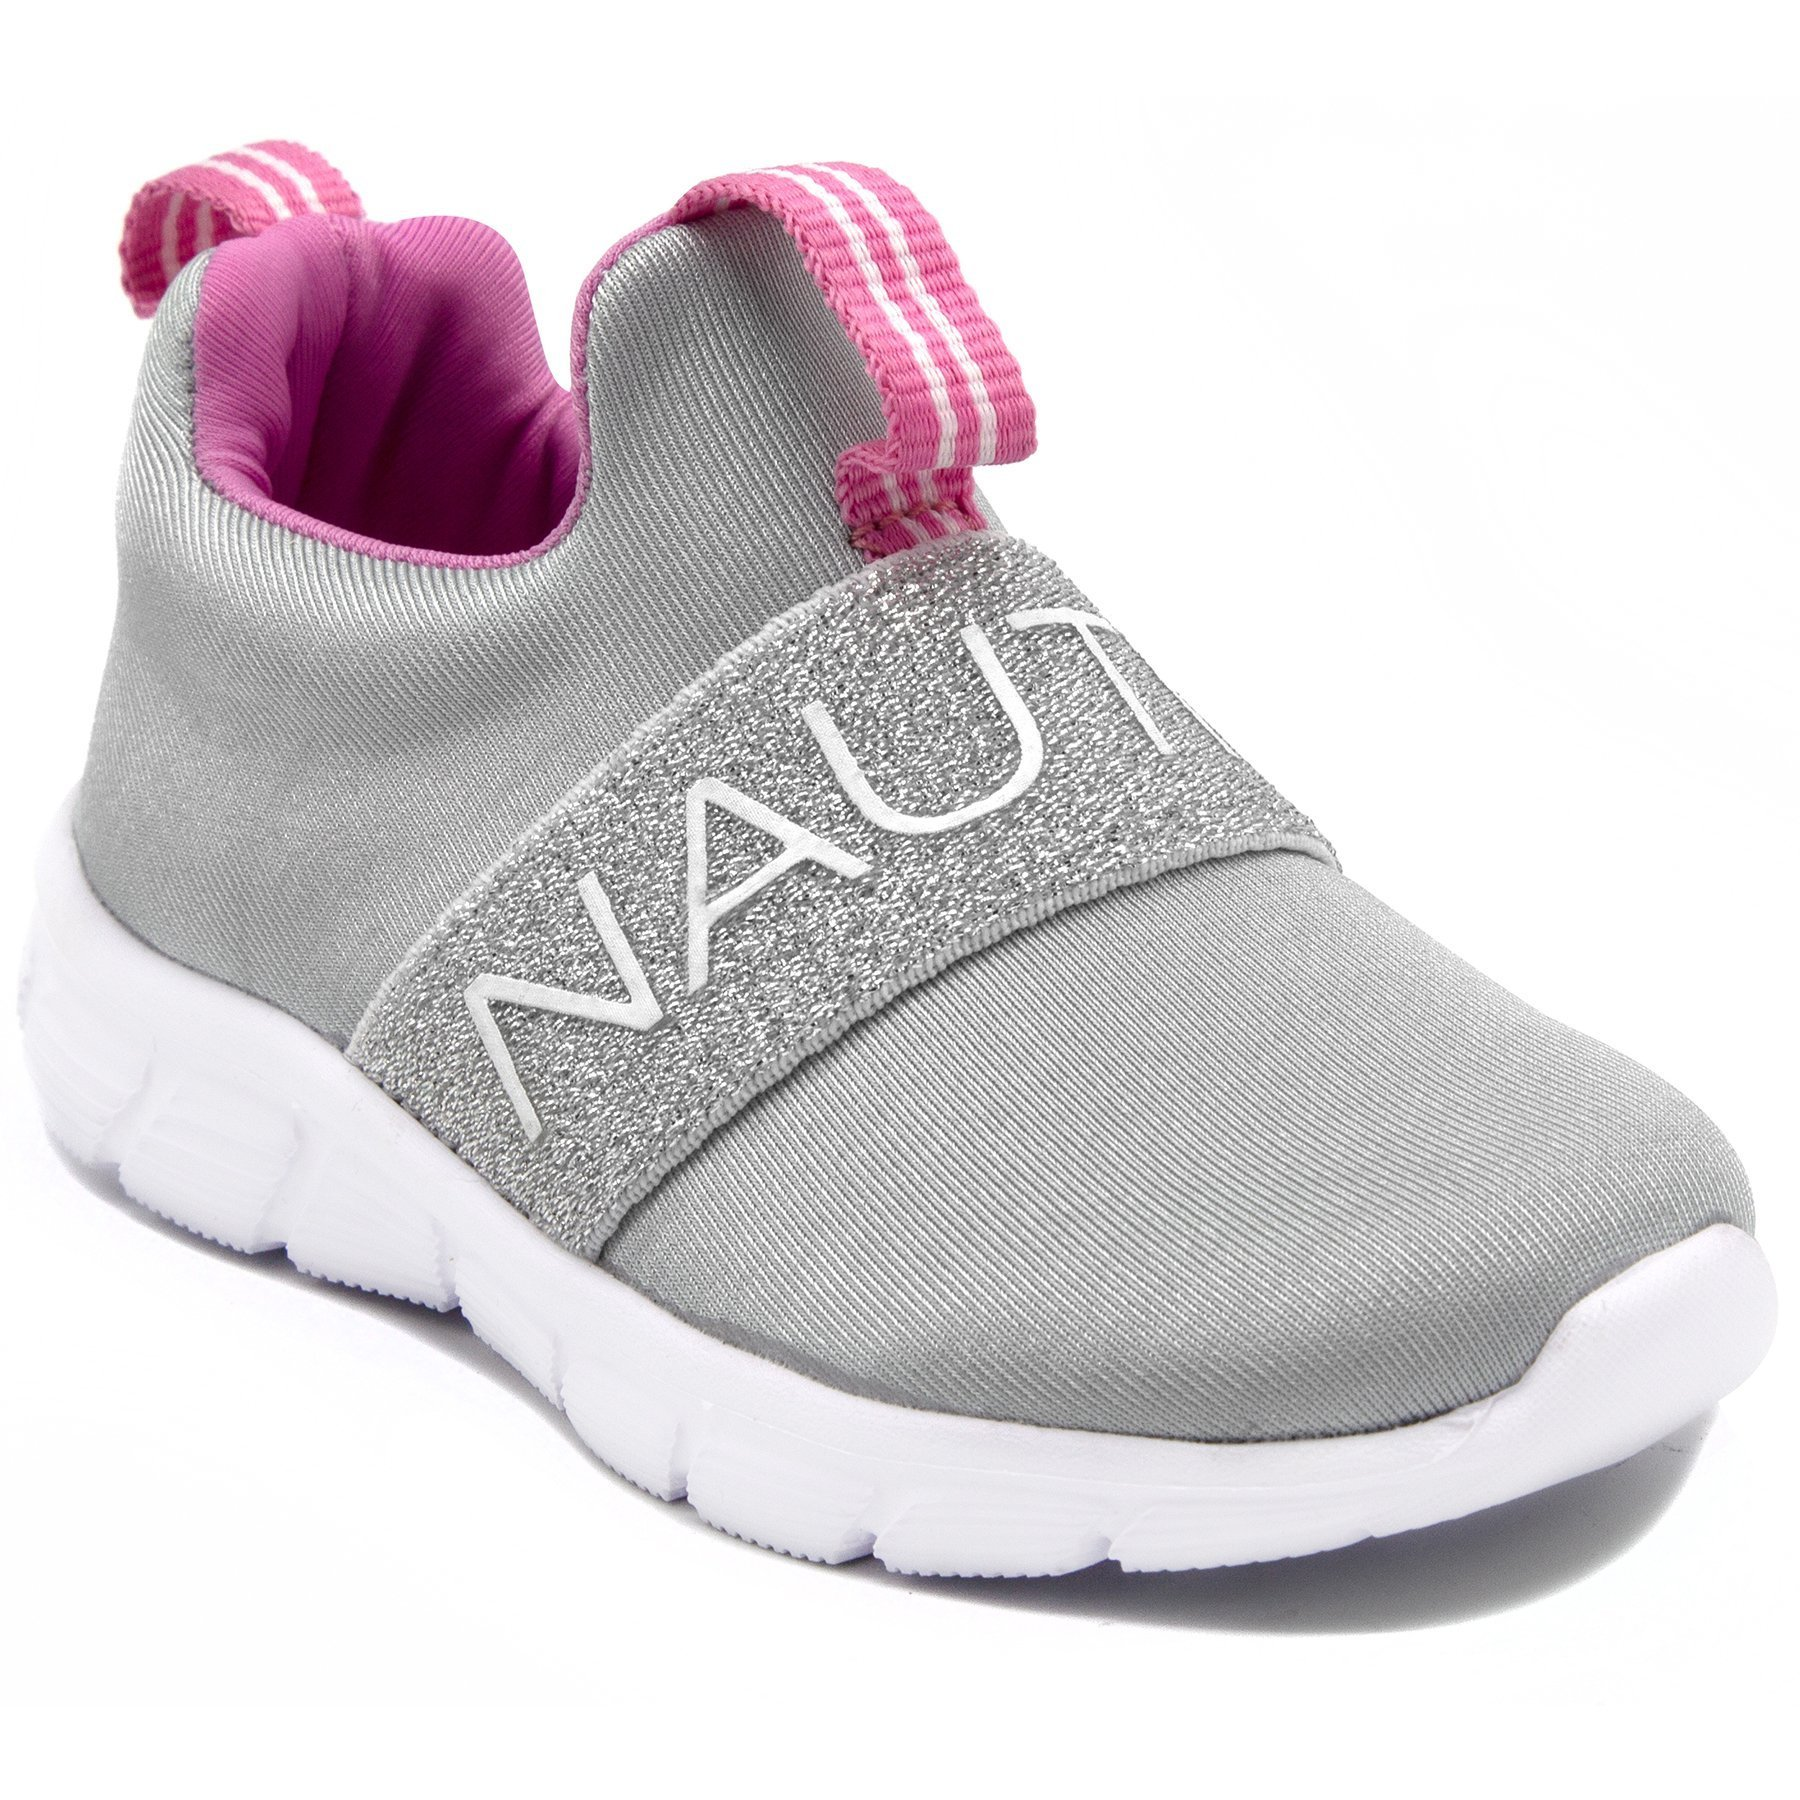 Nautica Kids Girls Fashion Sneaker Slip On Running Shoe-Grey-9